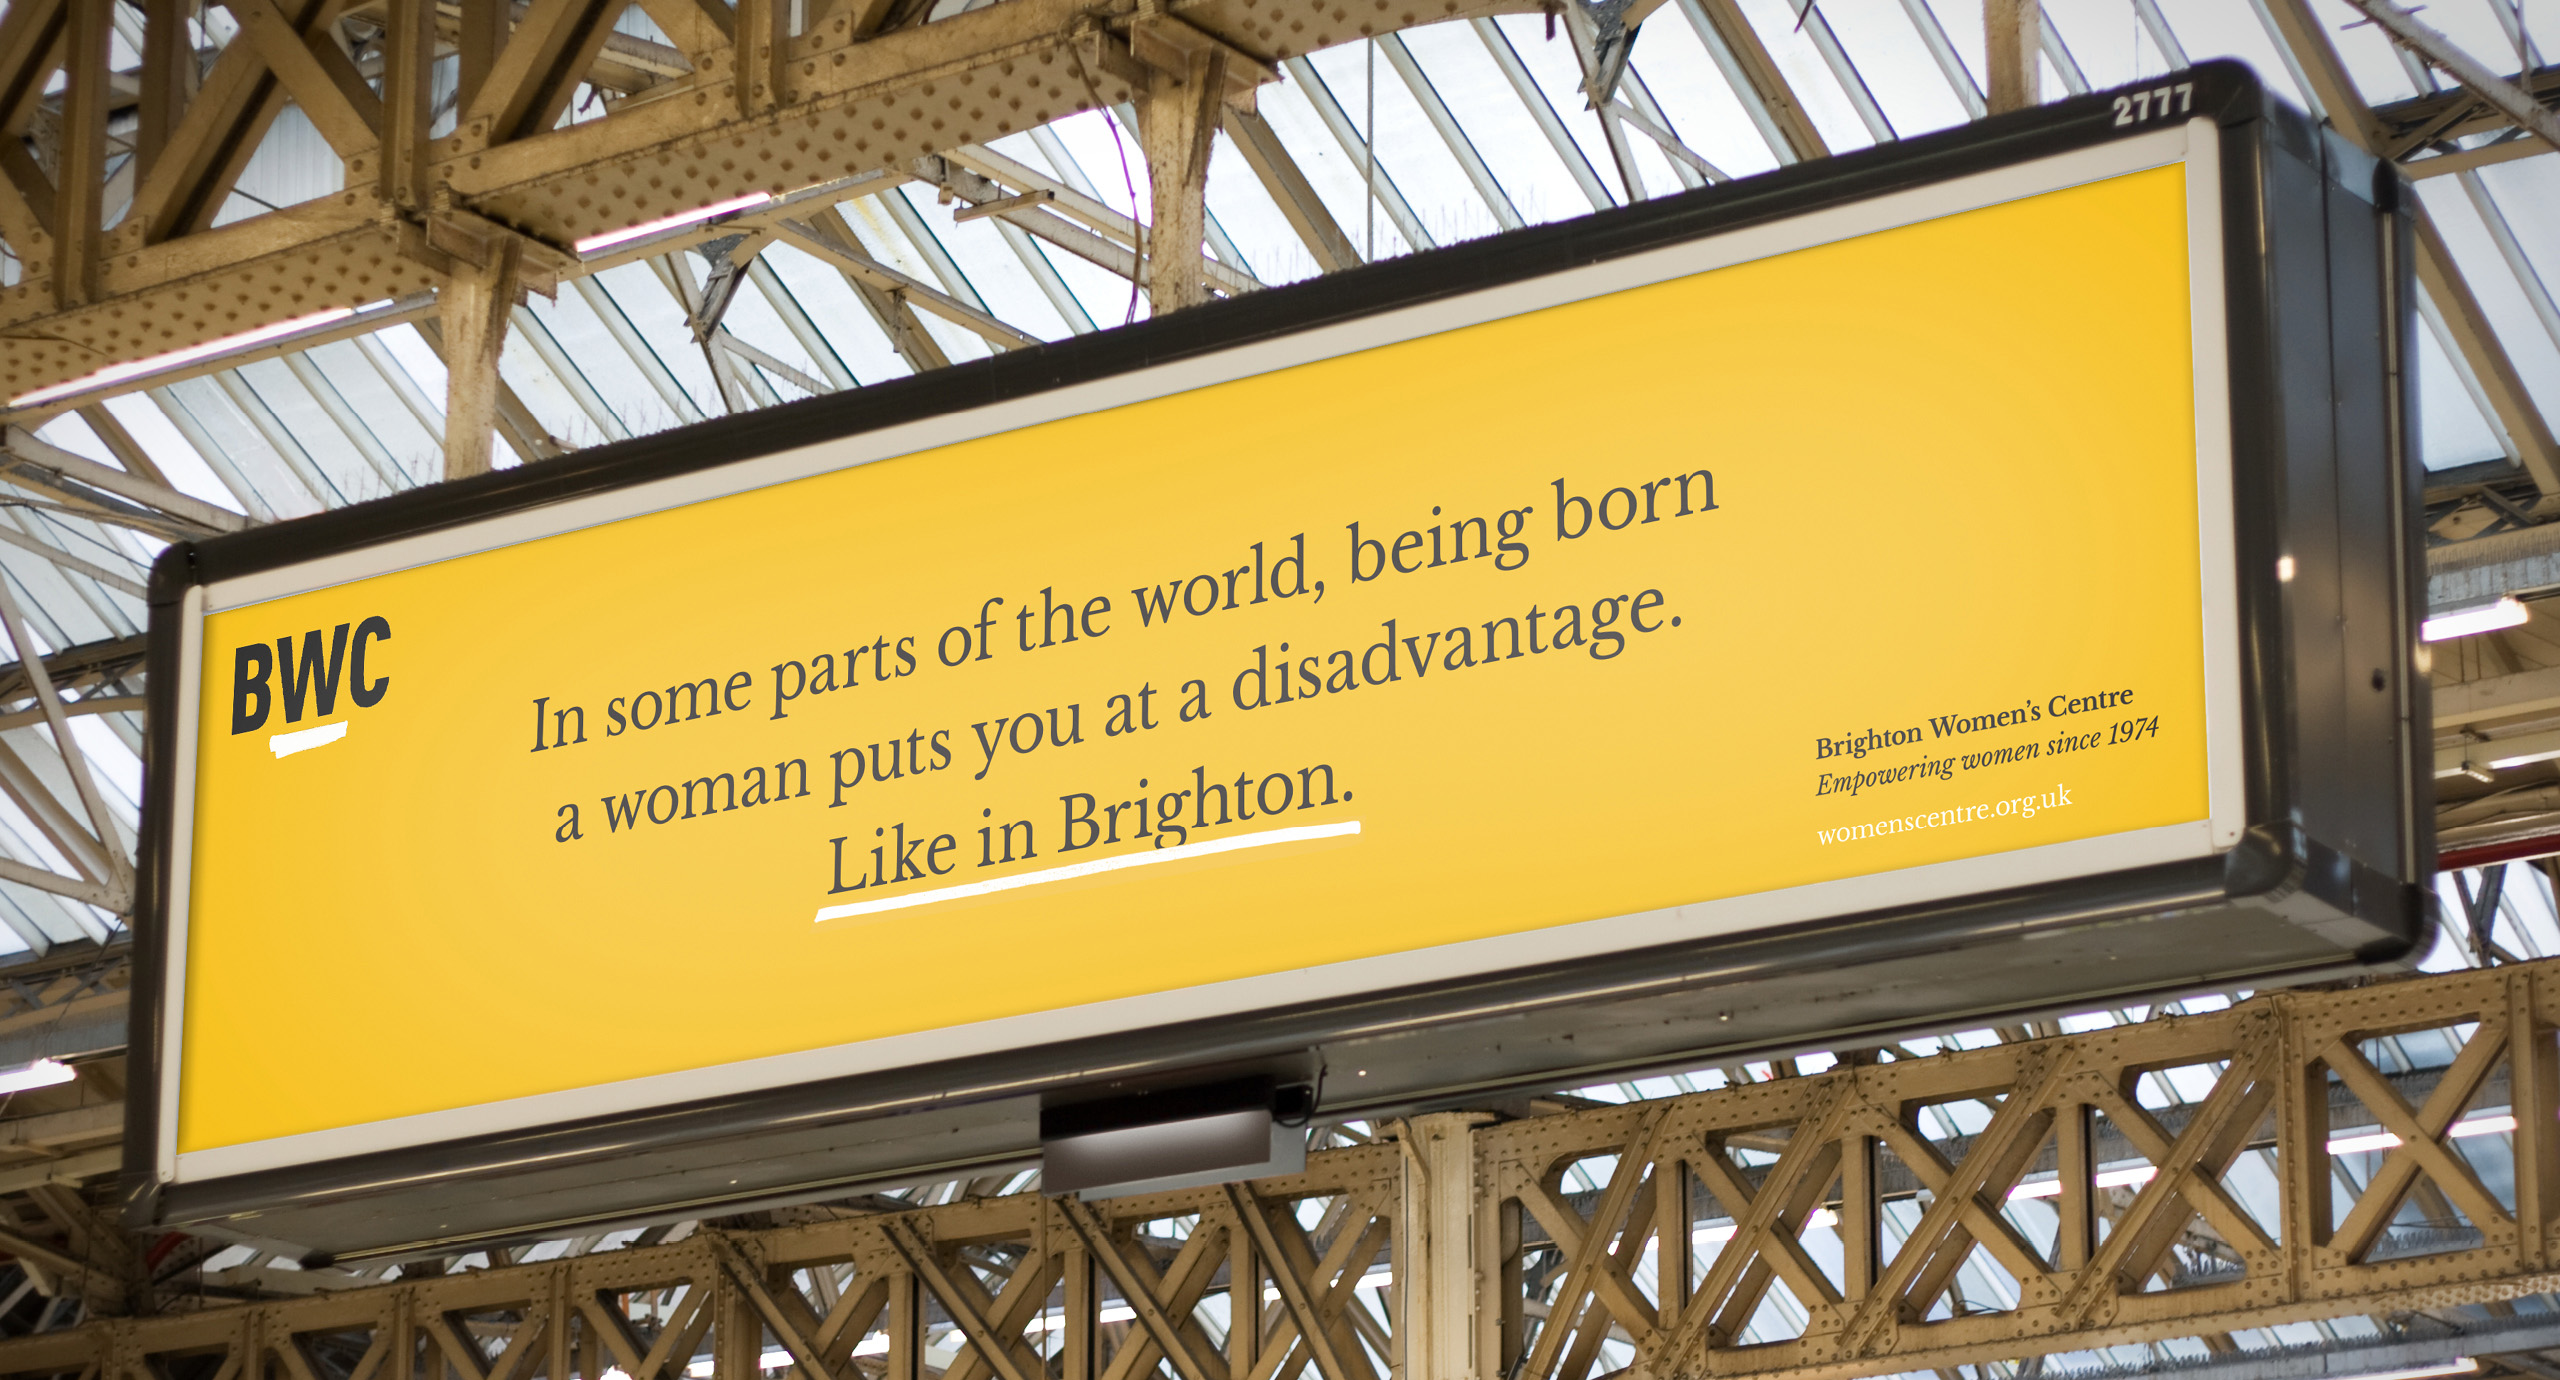 Baxter & Bailey - Brighton Women's Centre